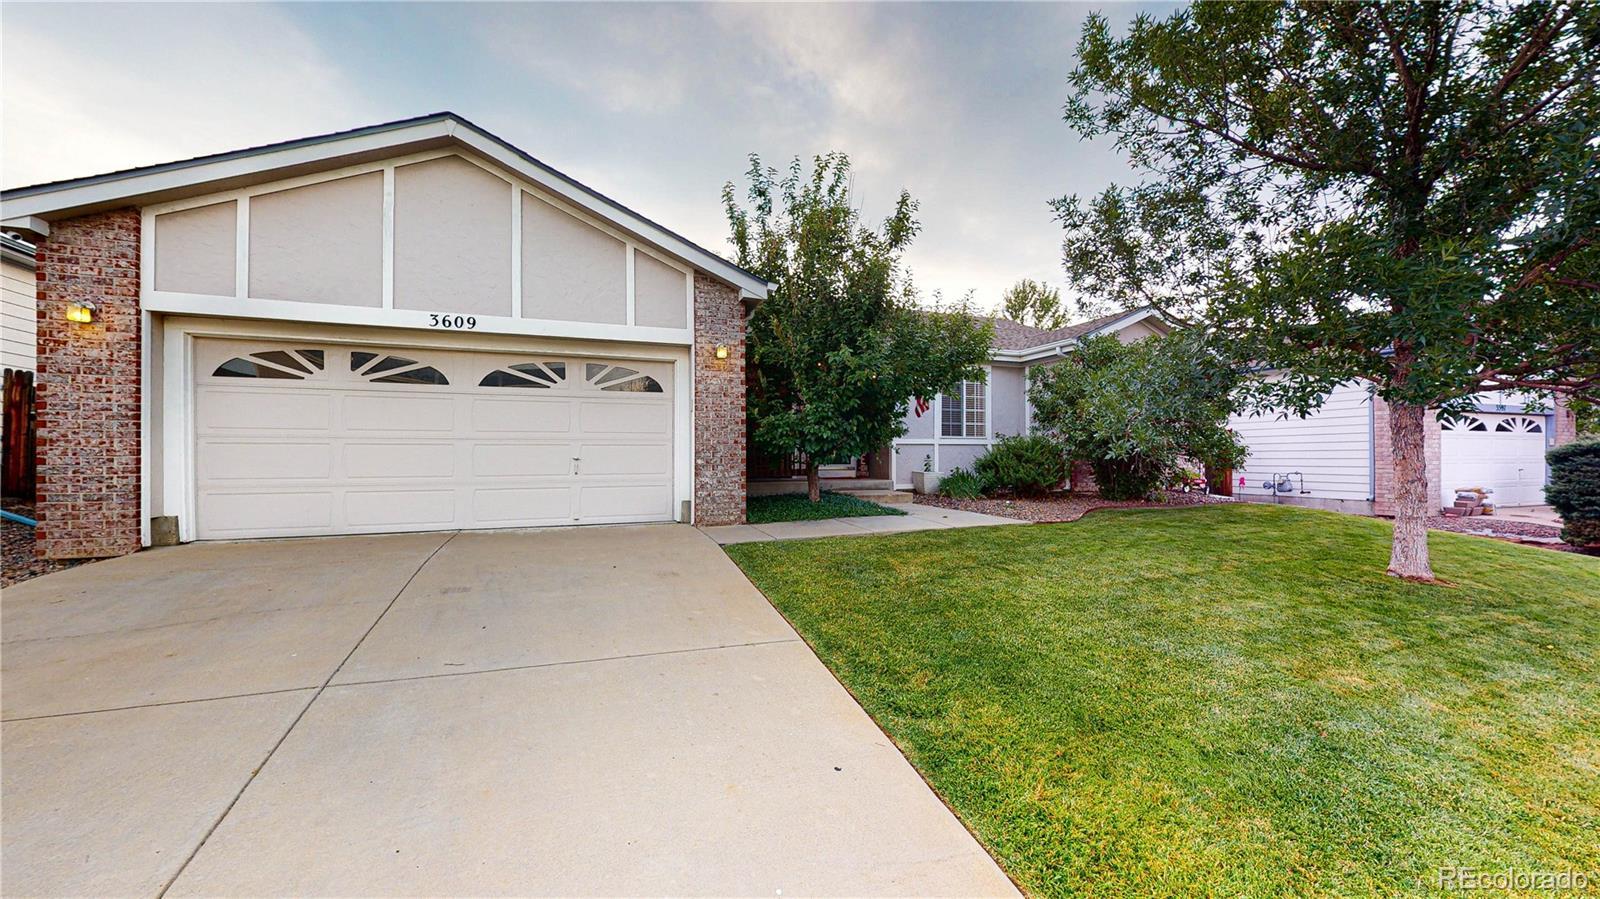 3609 S Killarney Street Property Photo - Aurora, CO real estate listing